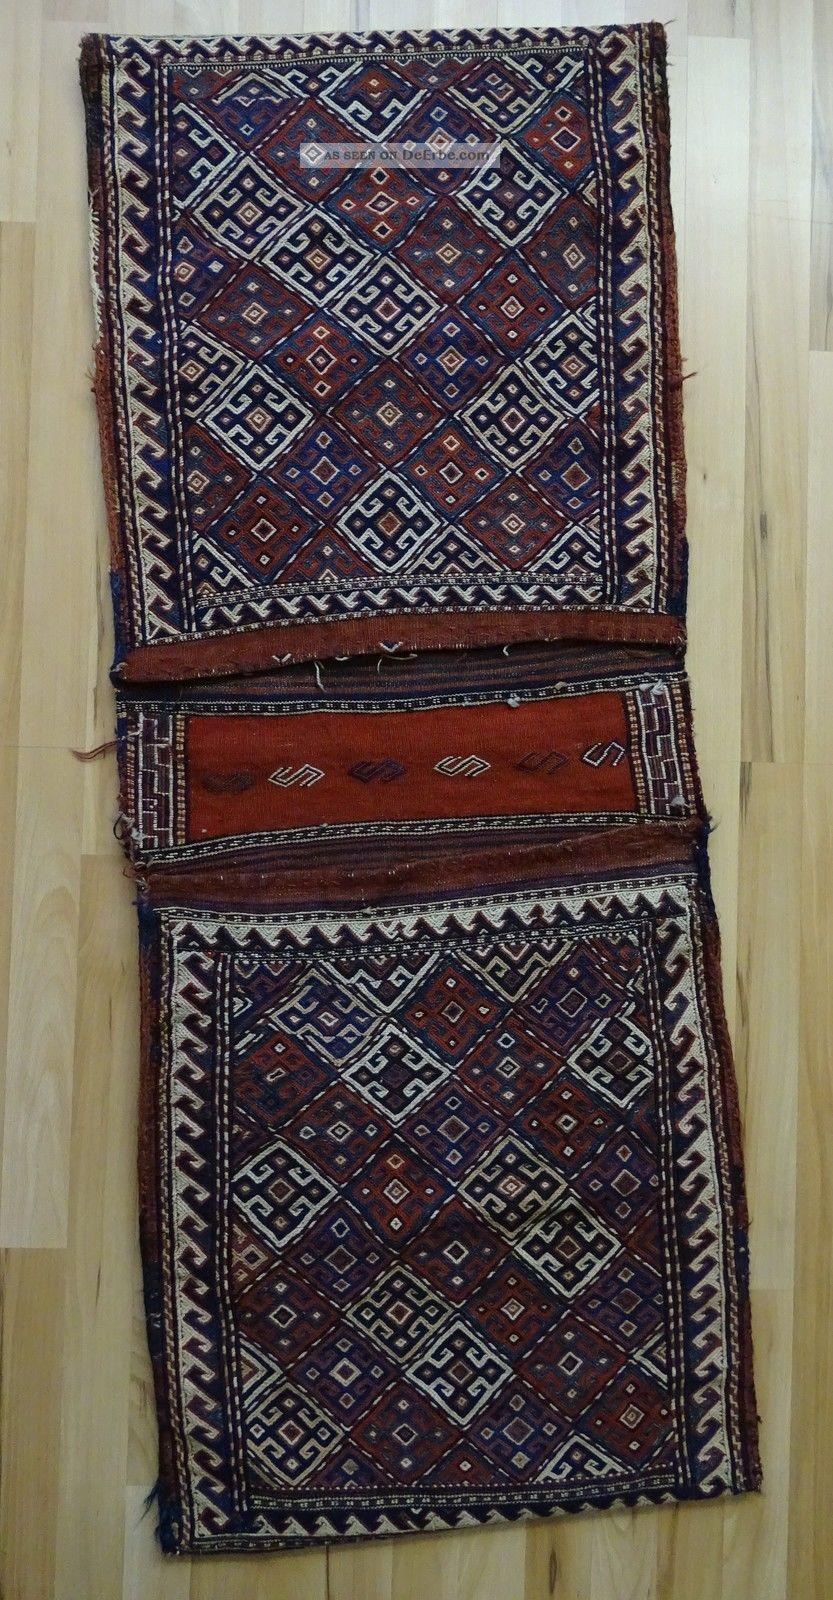 Echt Orient Teppich Persien Satteltasche Zertifikat Veit Ellwangen Teppiche & Flachgewebe Bild